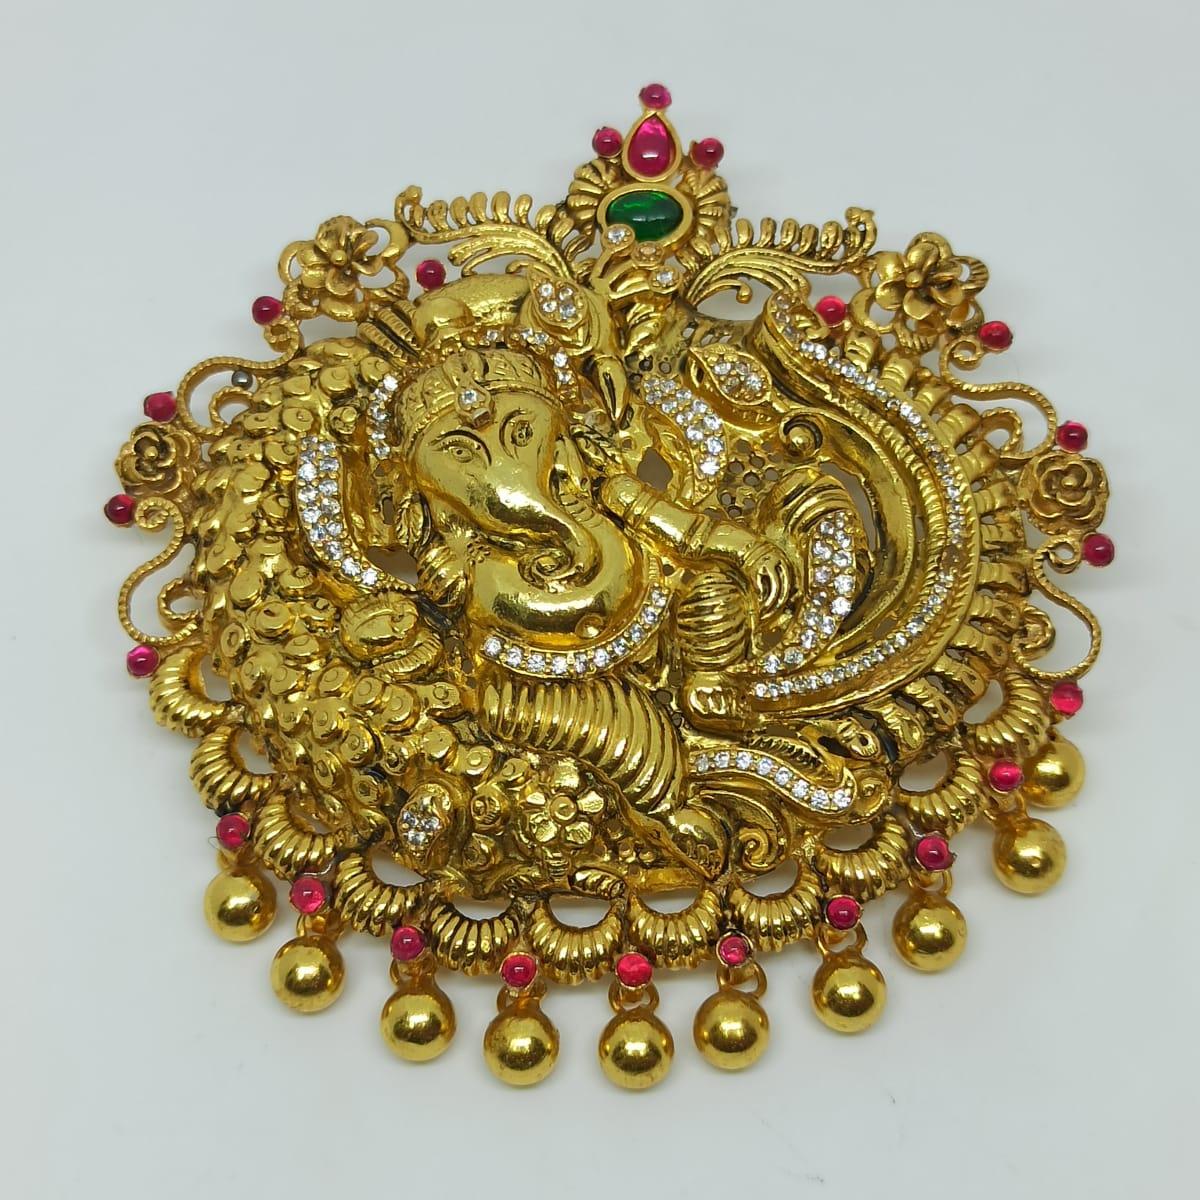 Ganesha Antique Cz Pendant